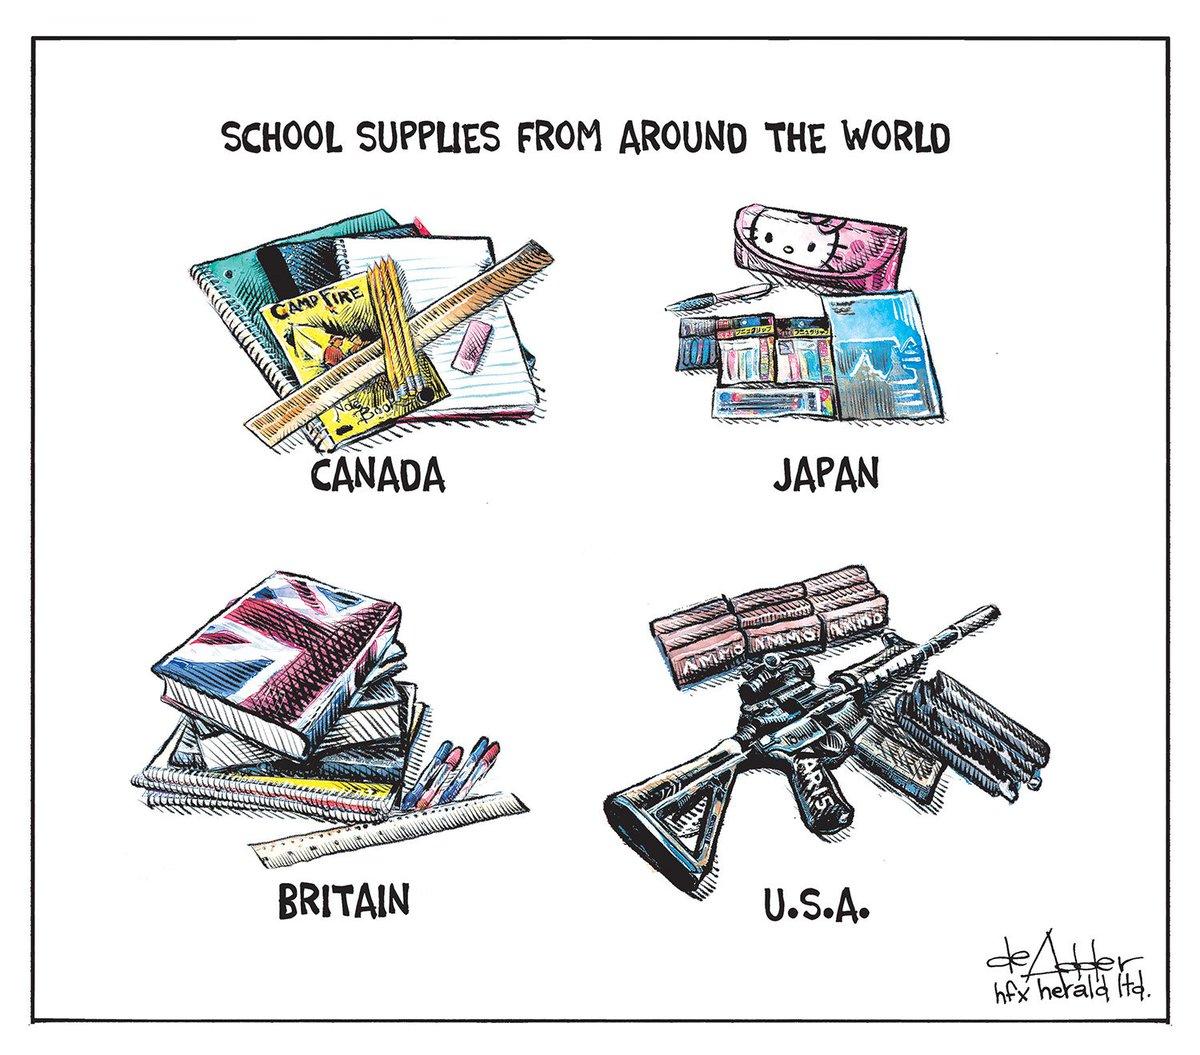 Cartoon for @chronicleherald #FloridaShooting #Florida #FloridaSchoolShooting #nra #AR15 #schoolshooting